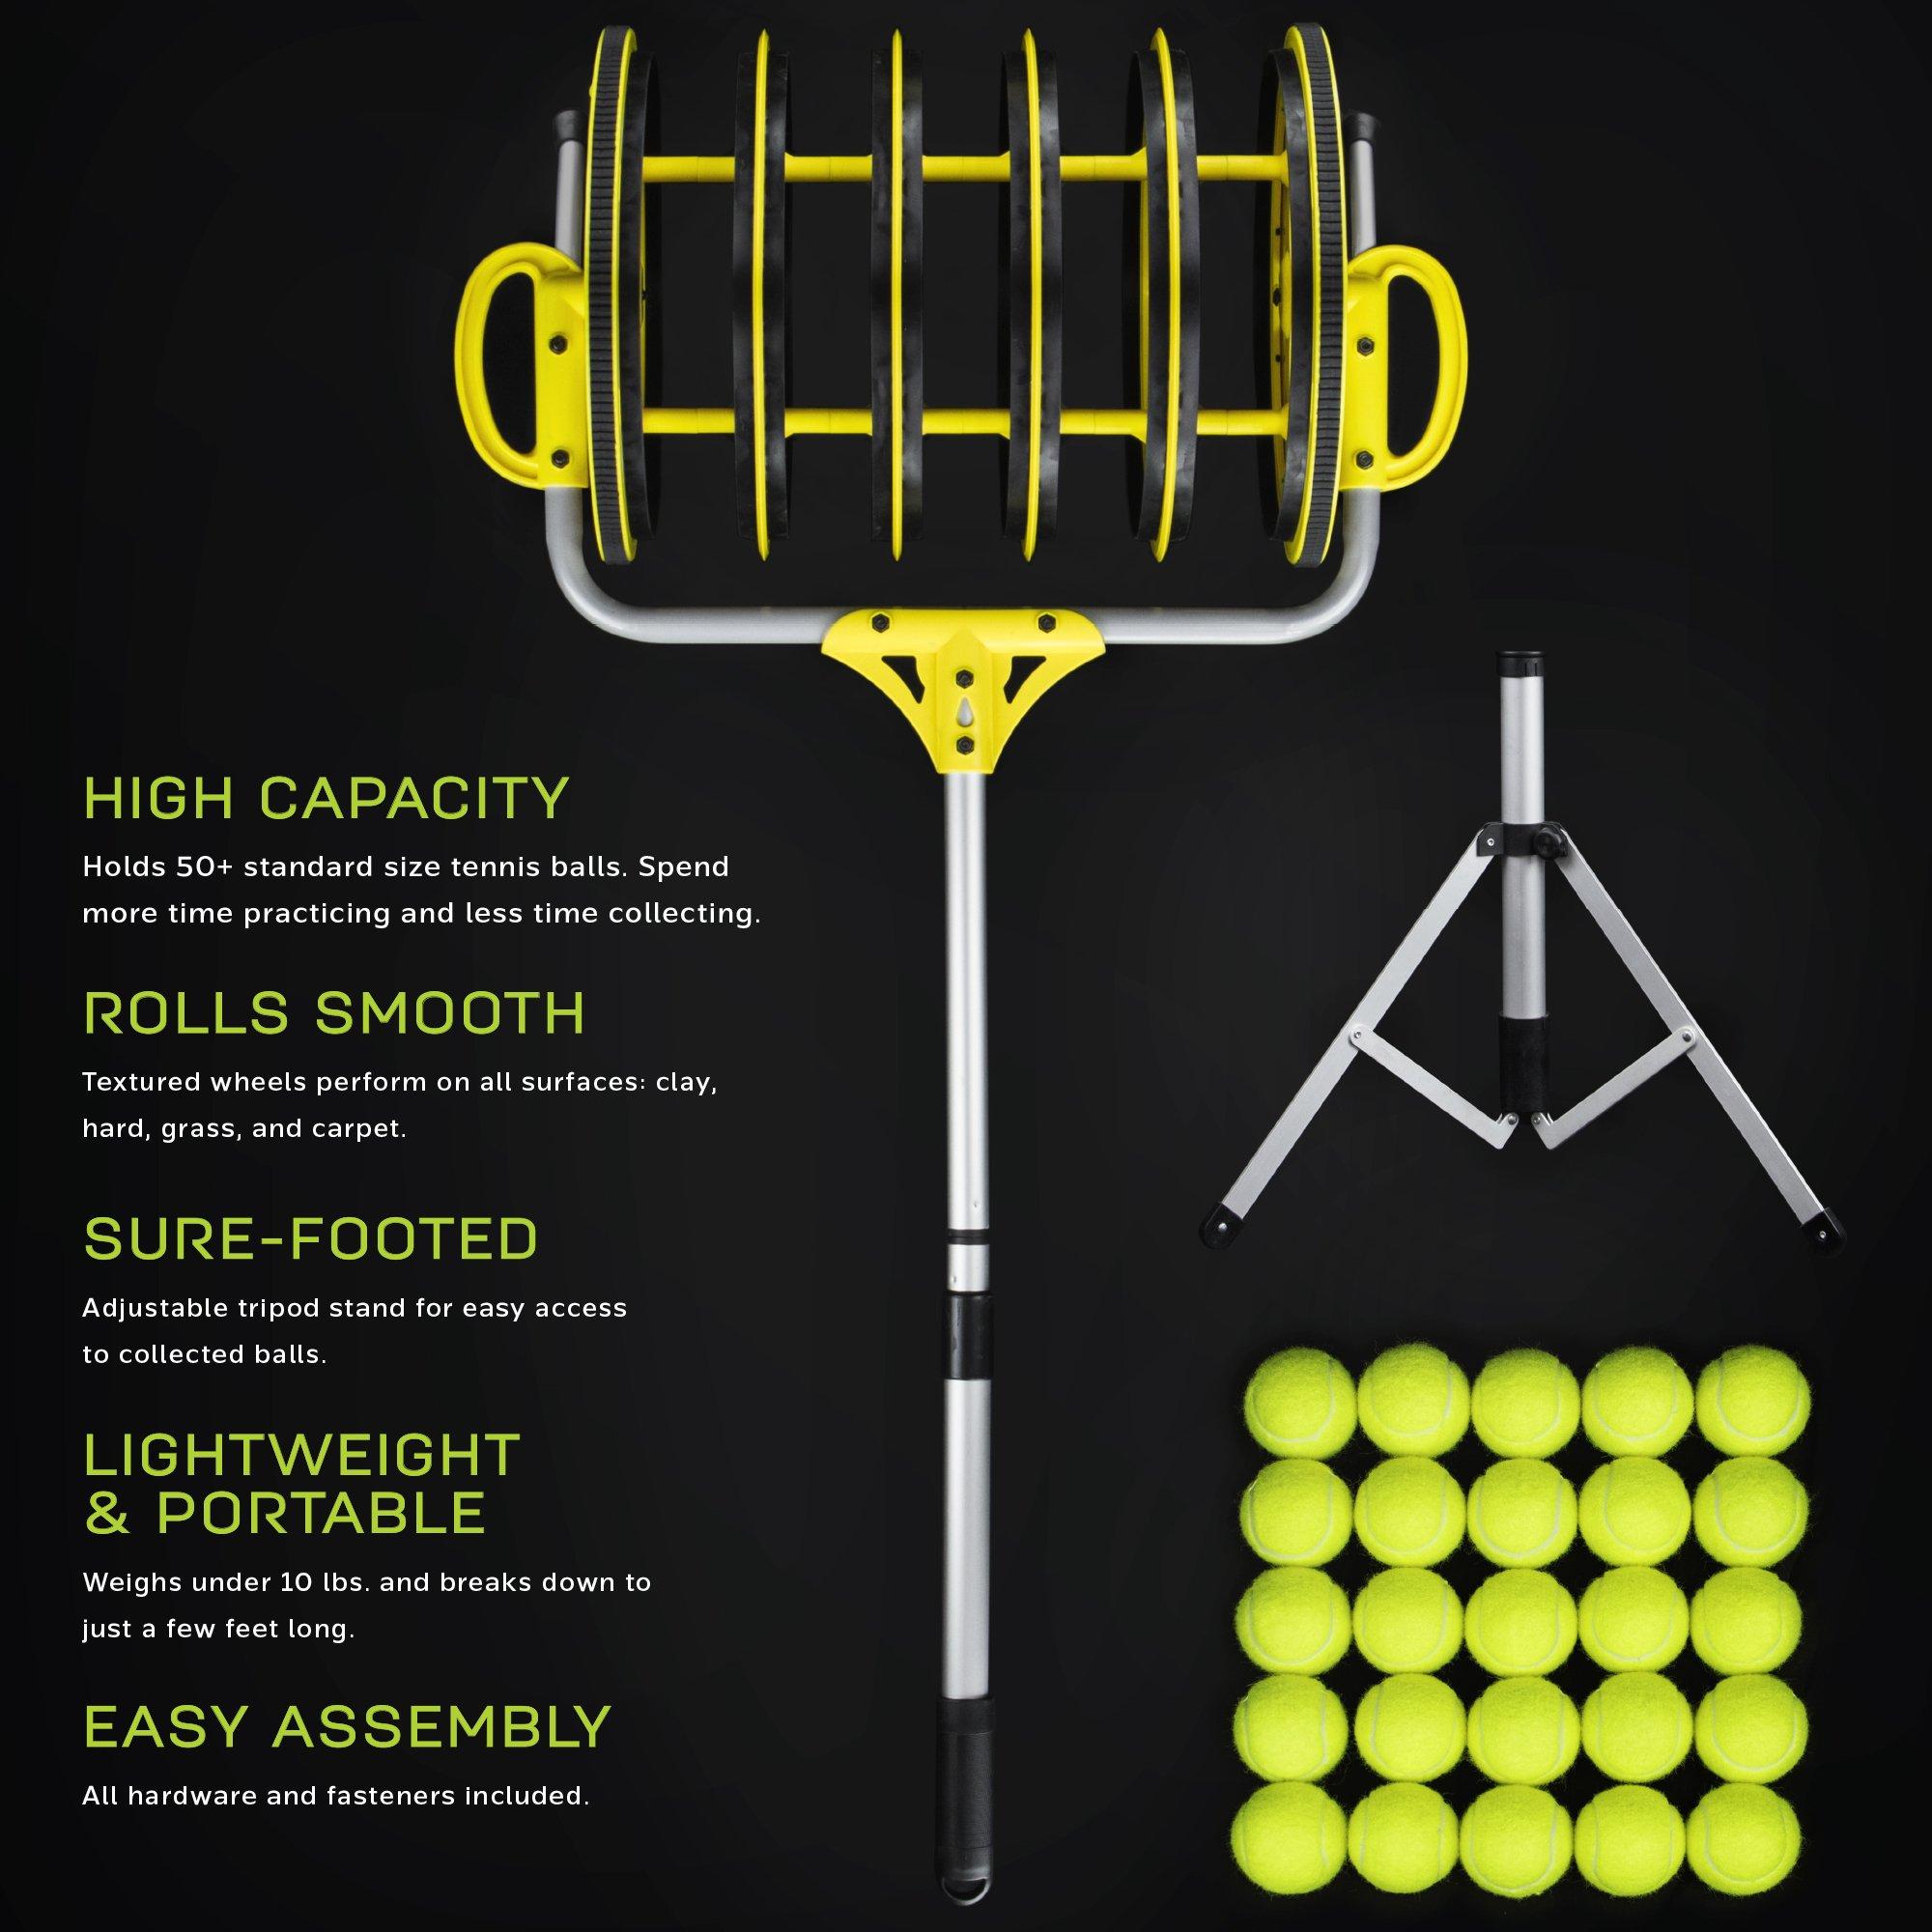 Deluxe Roller Tennis Ball Collector - Includes 25 Bonus Practice Balls! by Crown (Image #4)